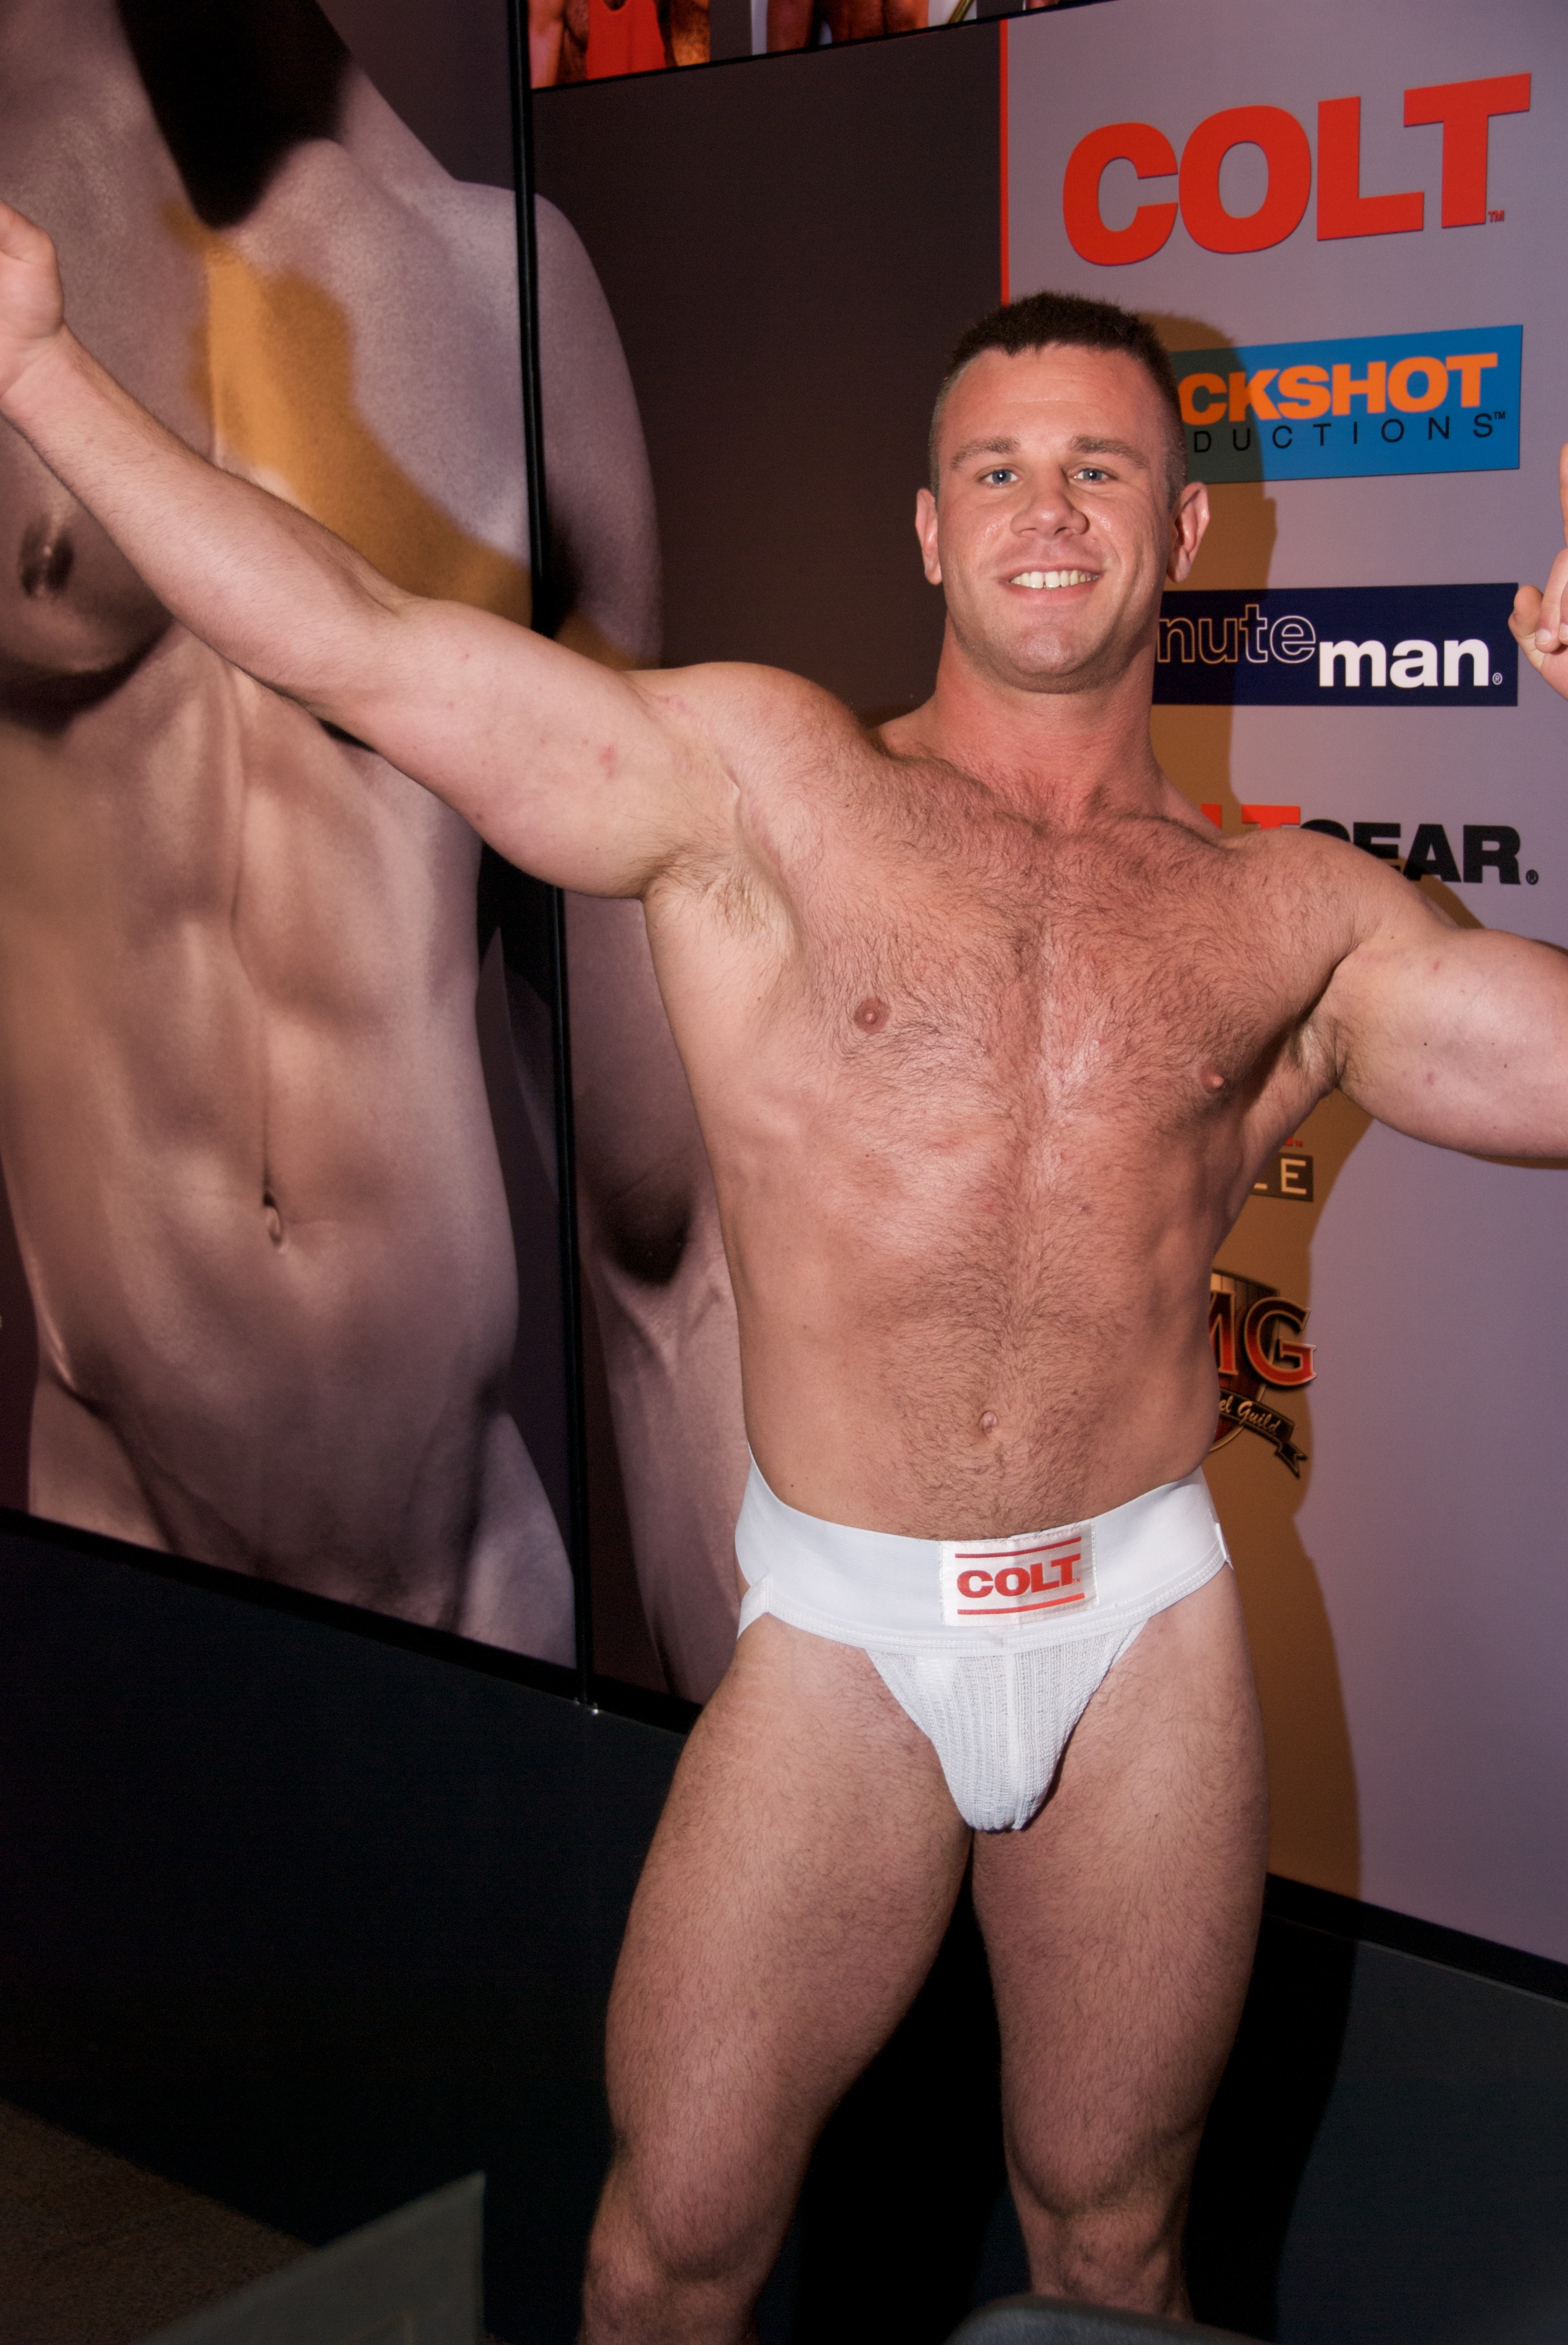 Big men bondage gay the man is so